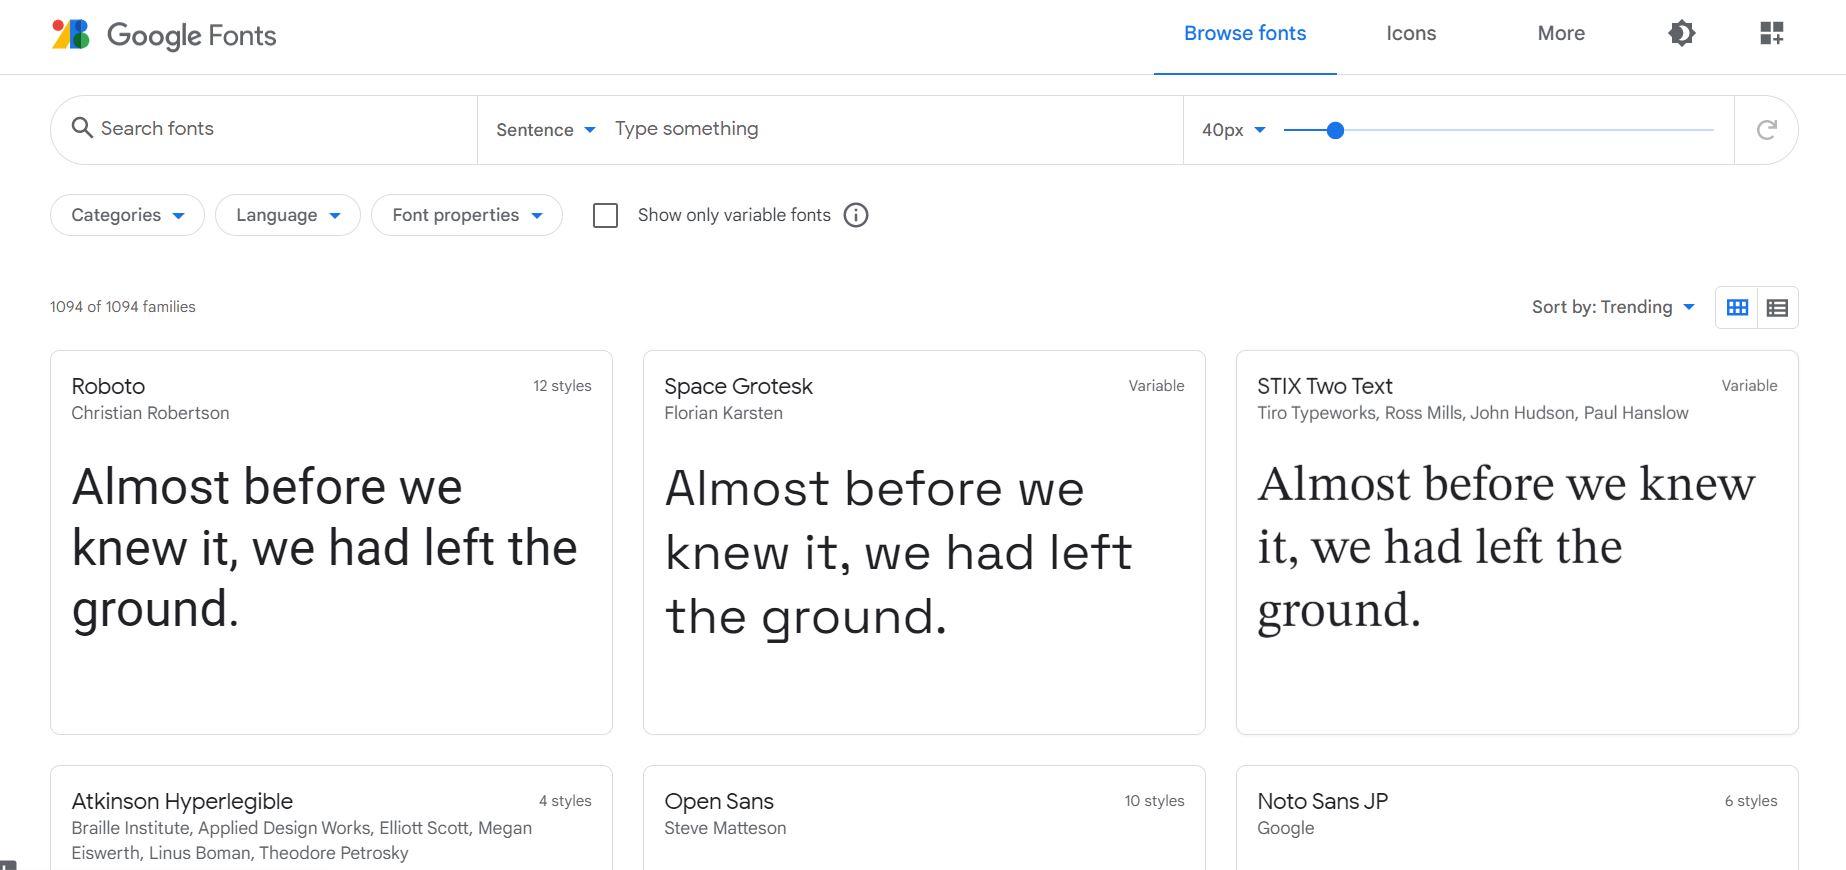 Biblioteca de fuentes en Google Fonts